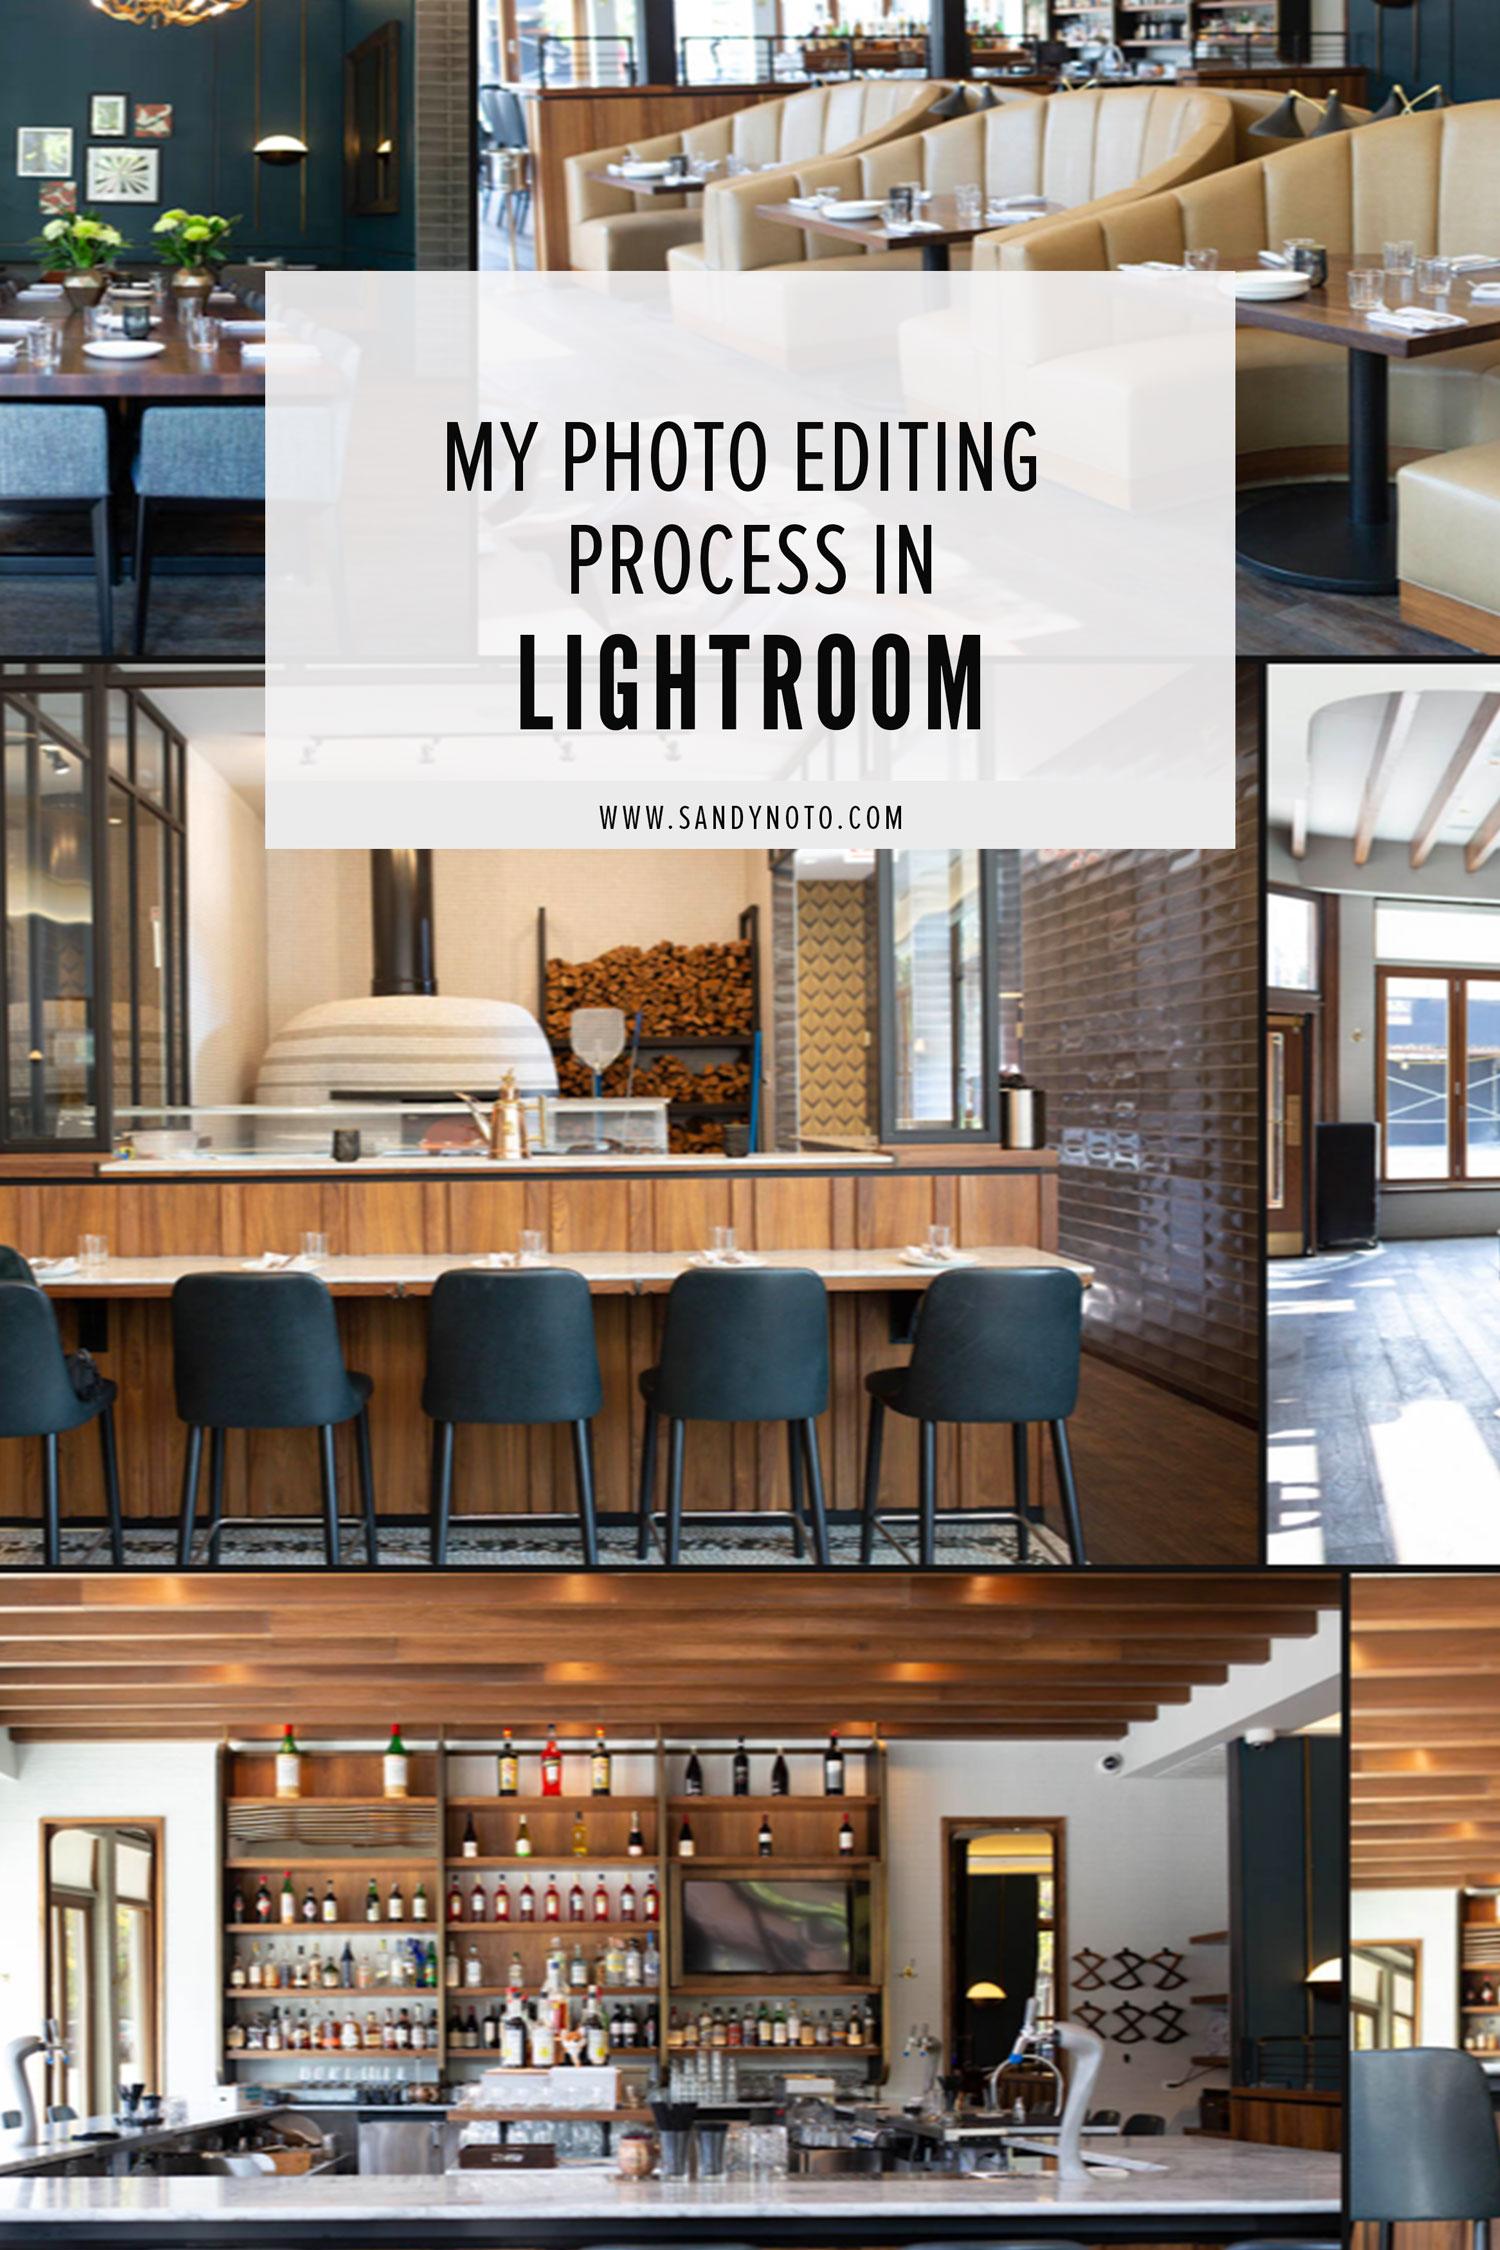 My Photo Editing Process